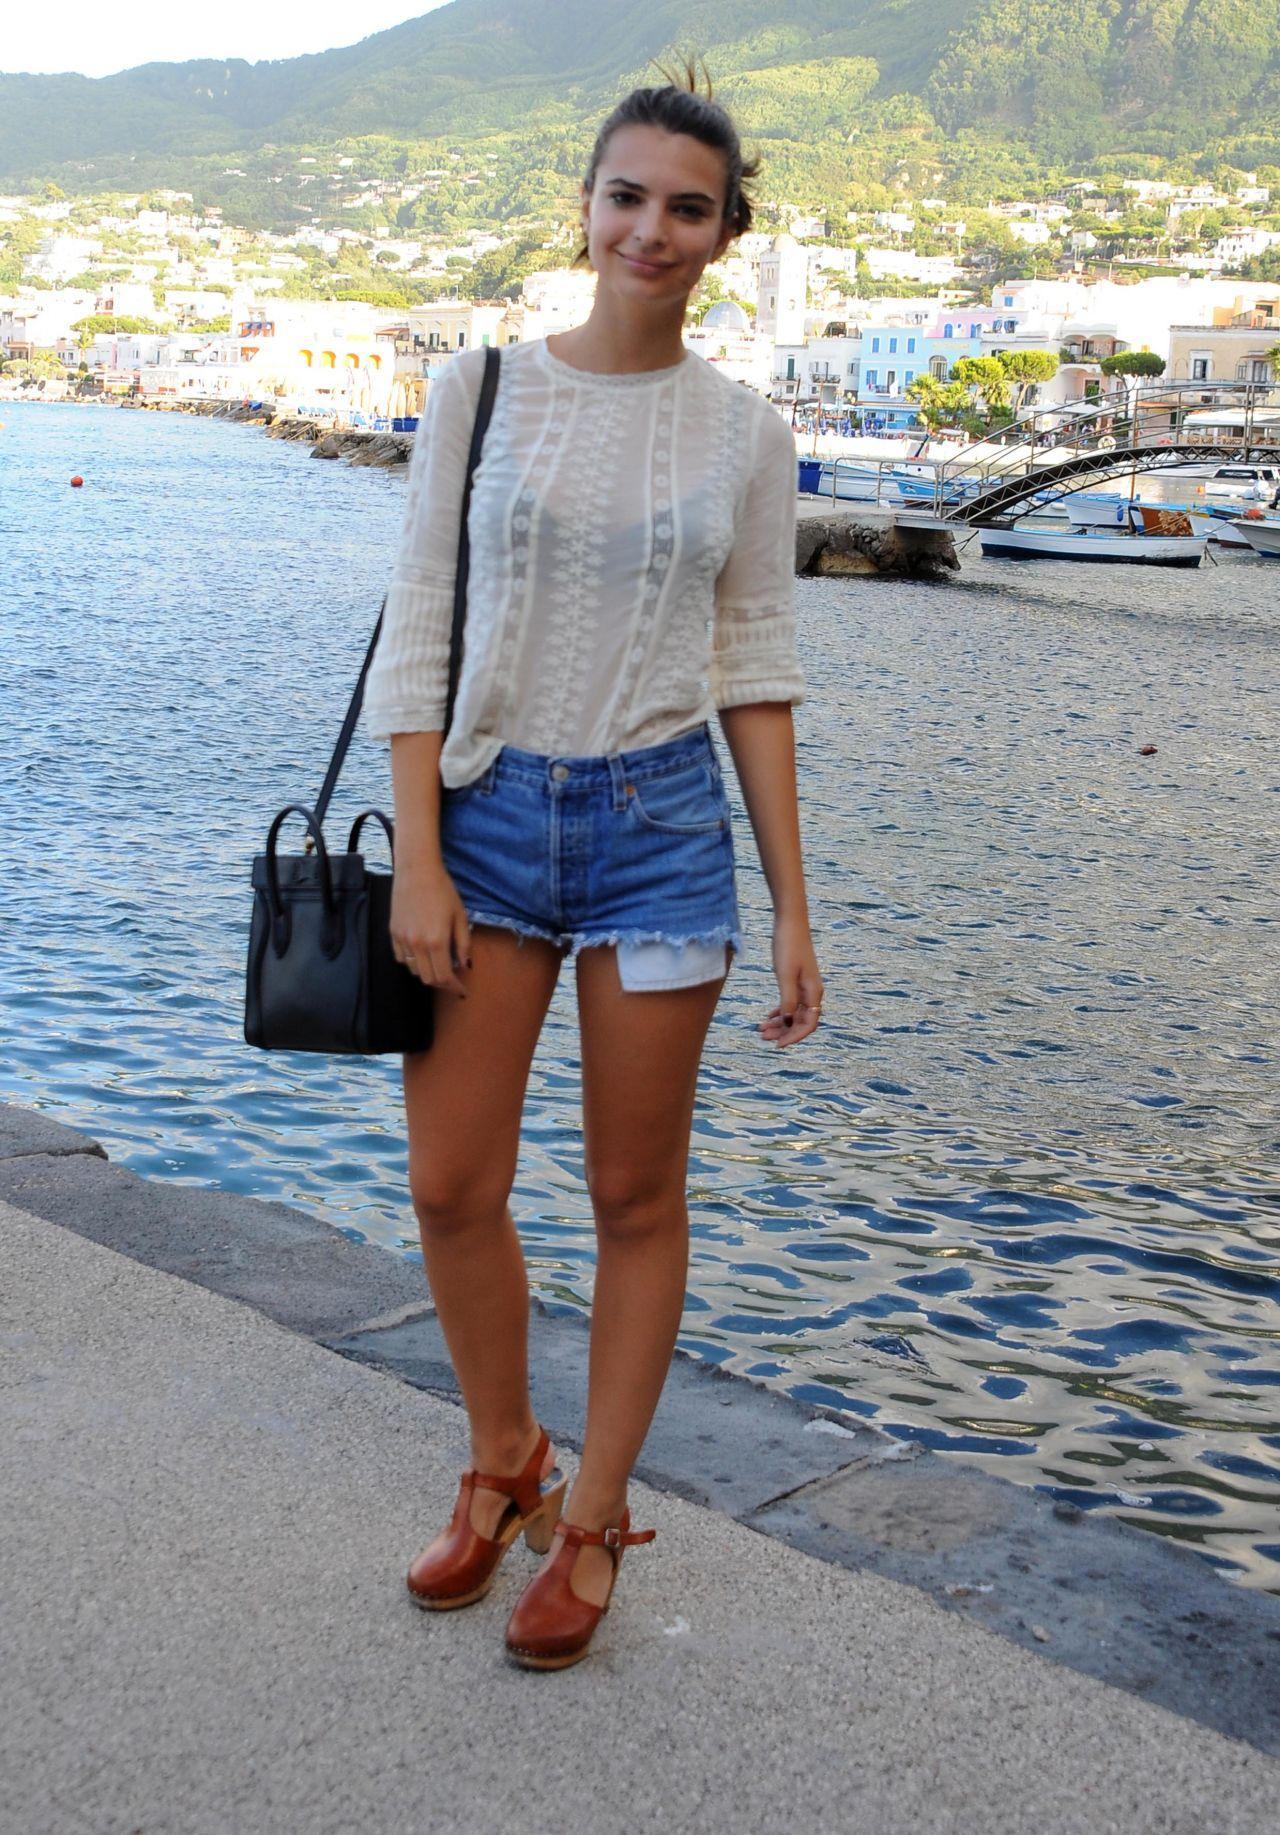 Emily Ratajkowski Perfect Ass In Thong Bikini - Hot Celebs